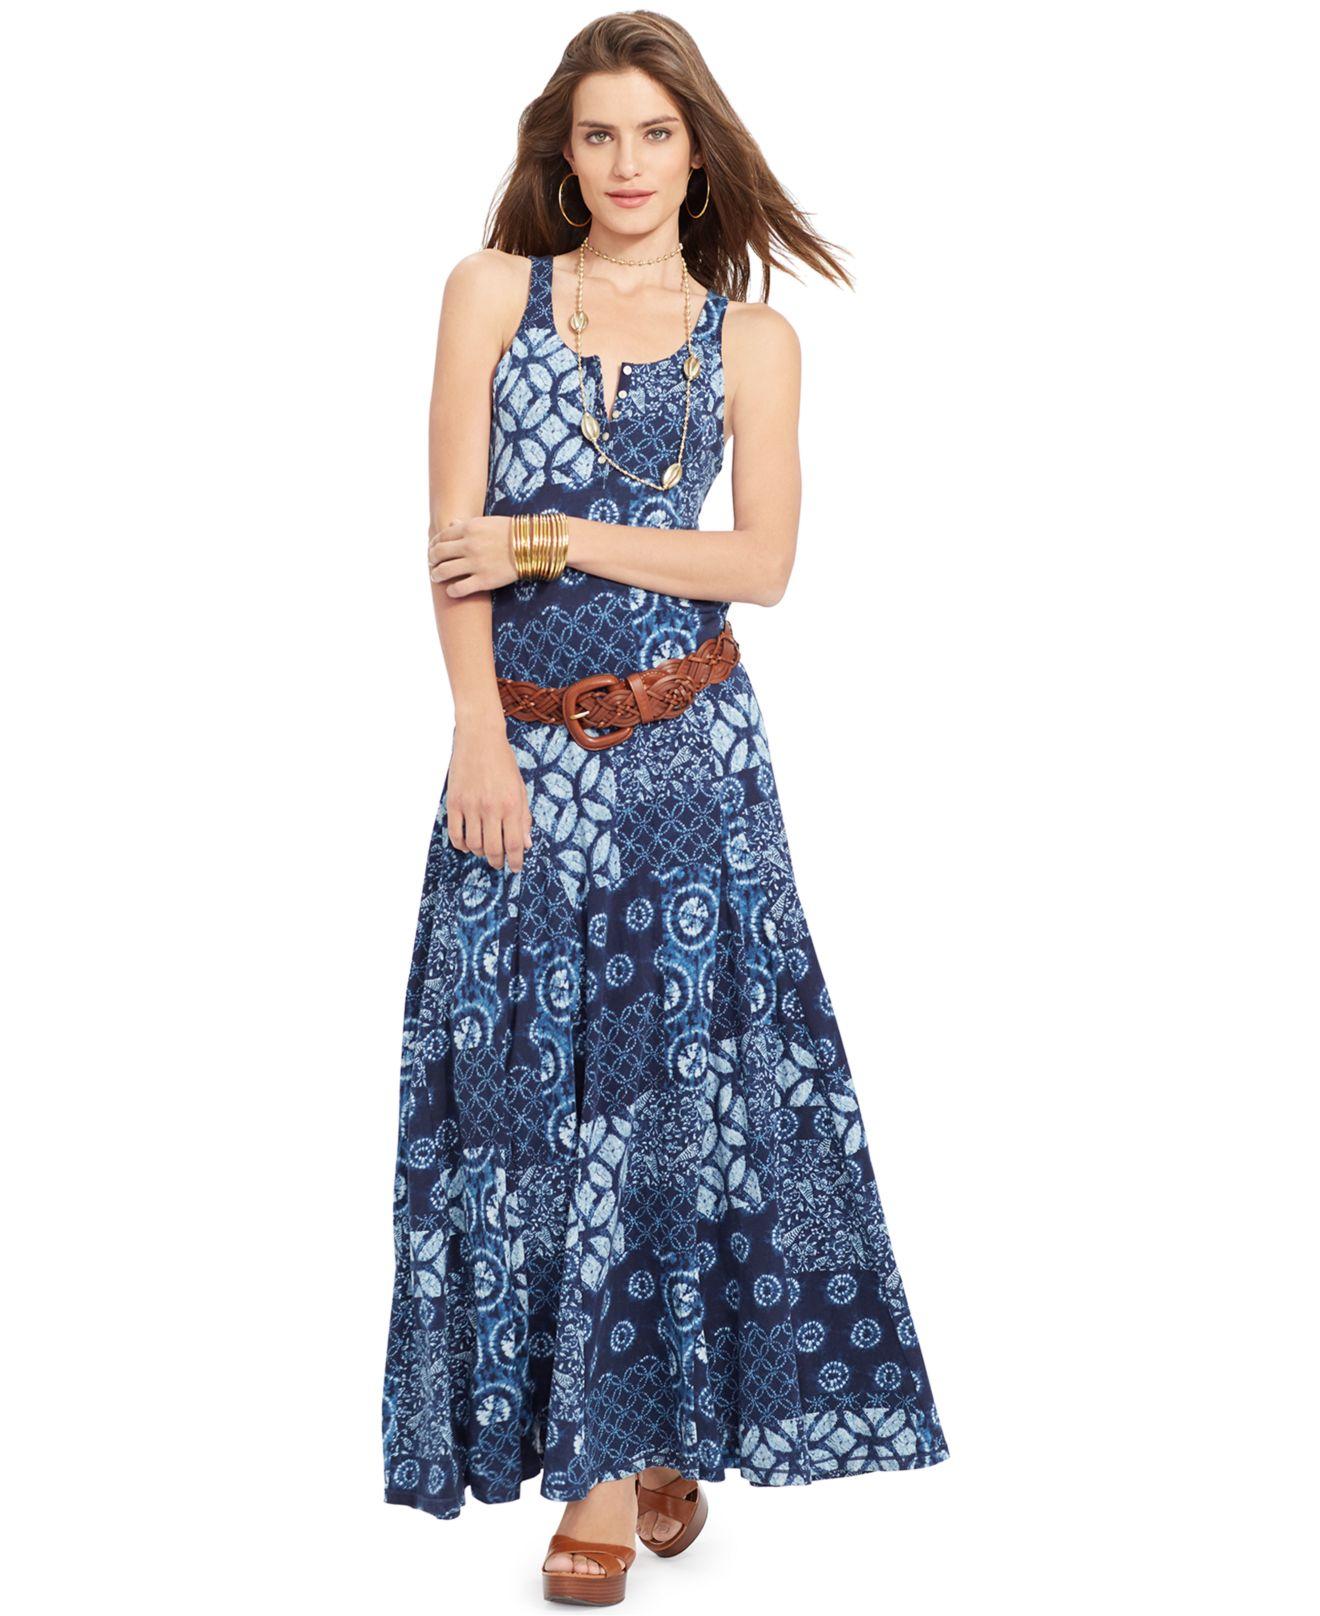 5e0ddc4ec7 Lyst - Lauren by Ralph Lauren Lauren Jeans Co. Sleeveless Printed ...